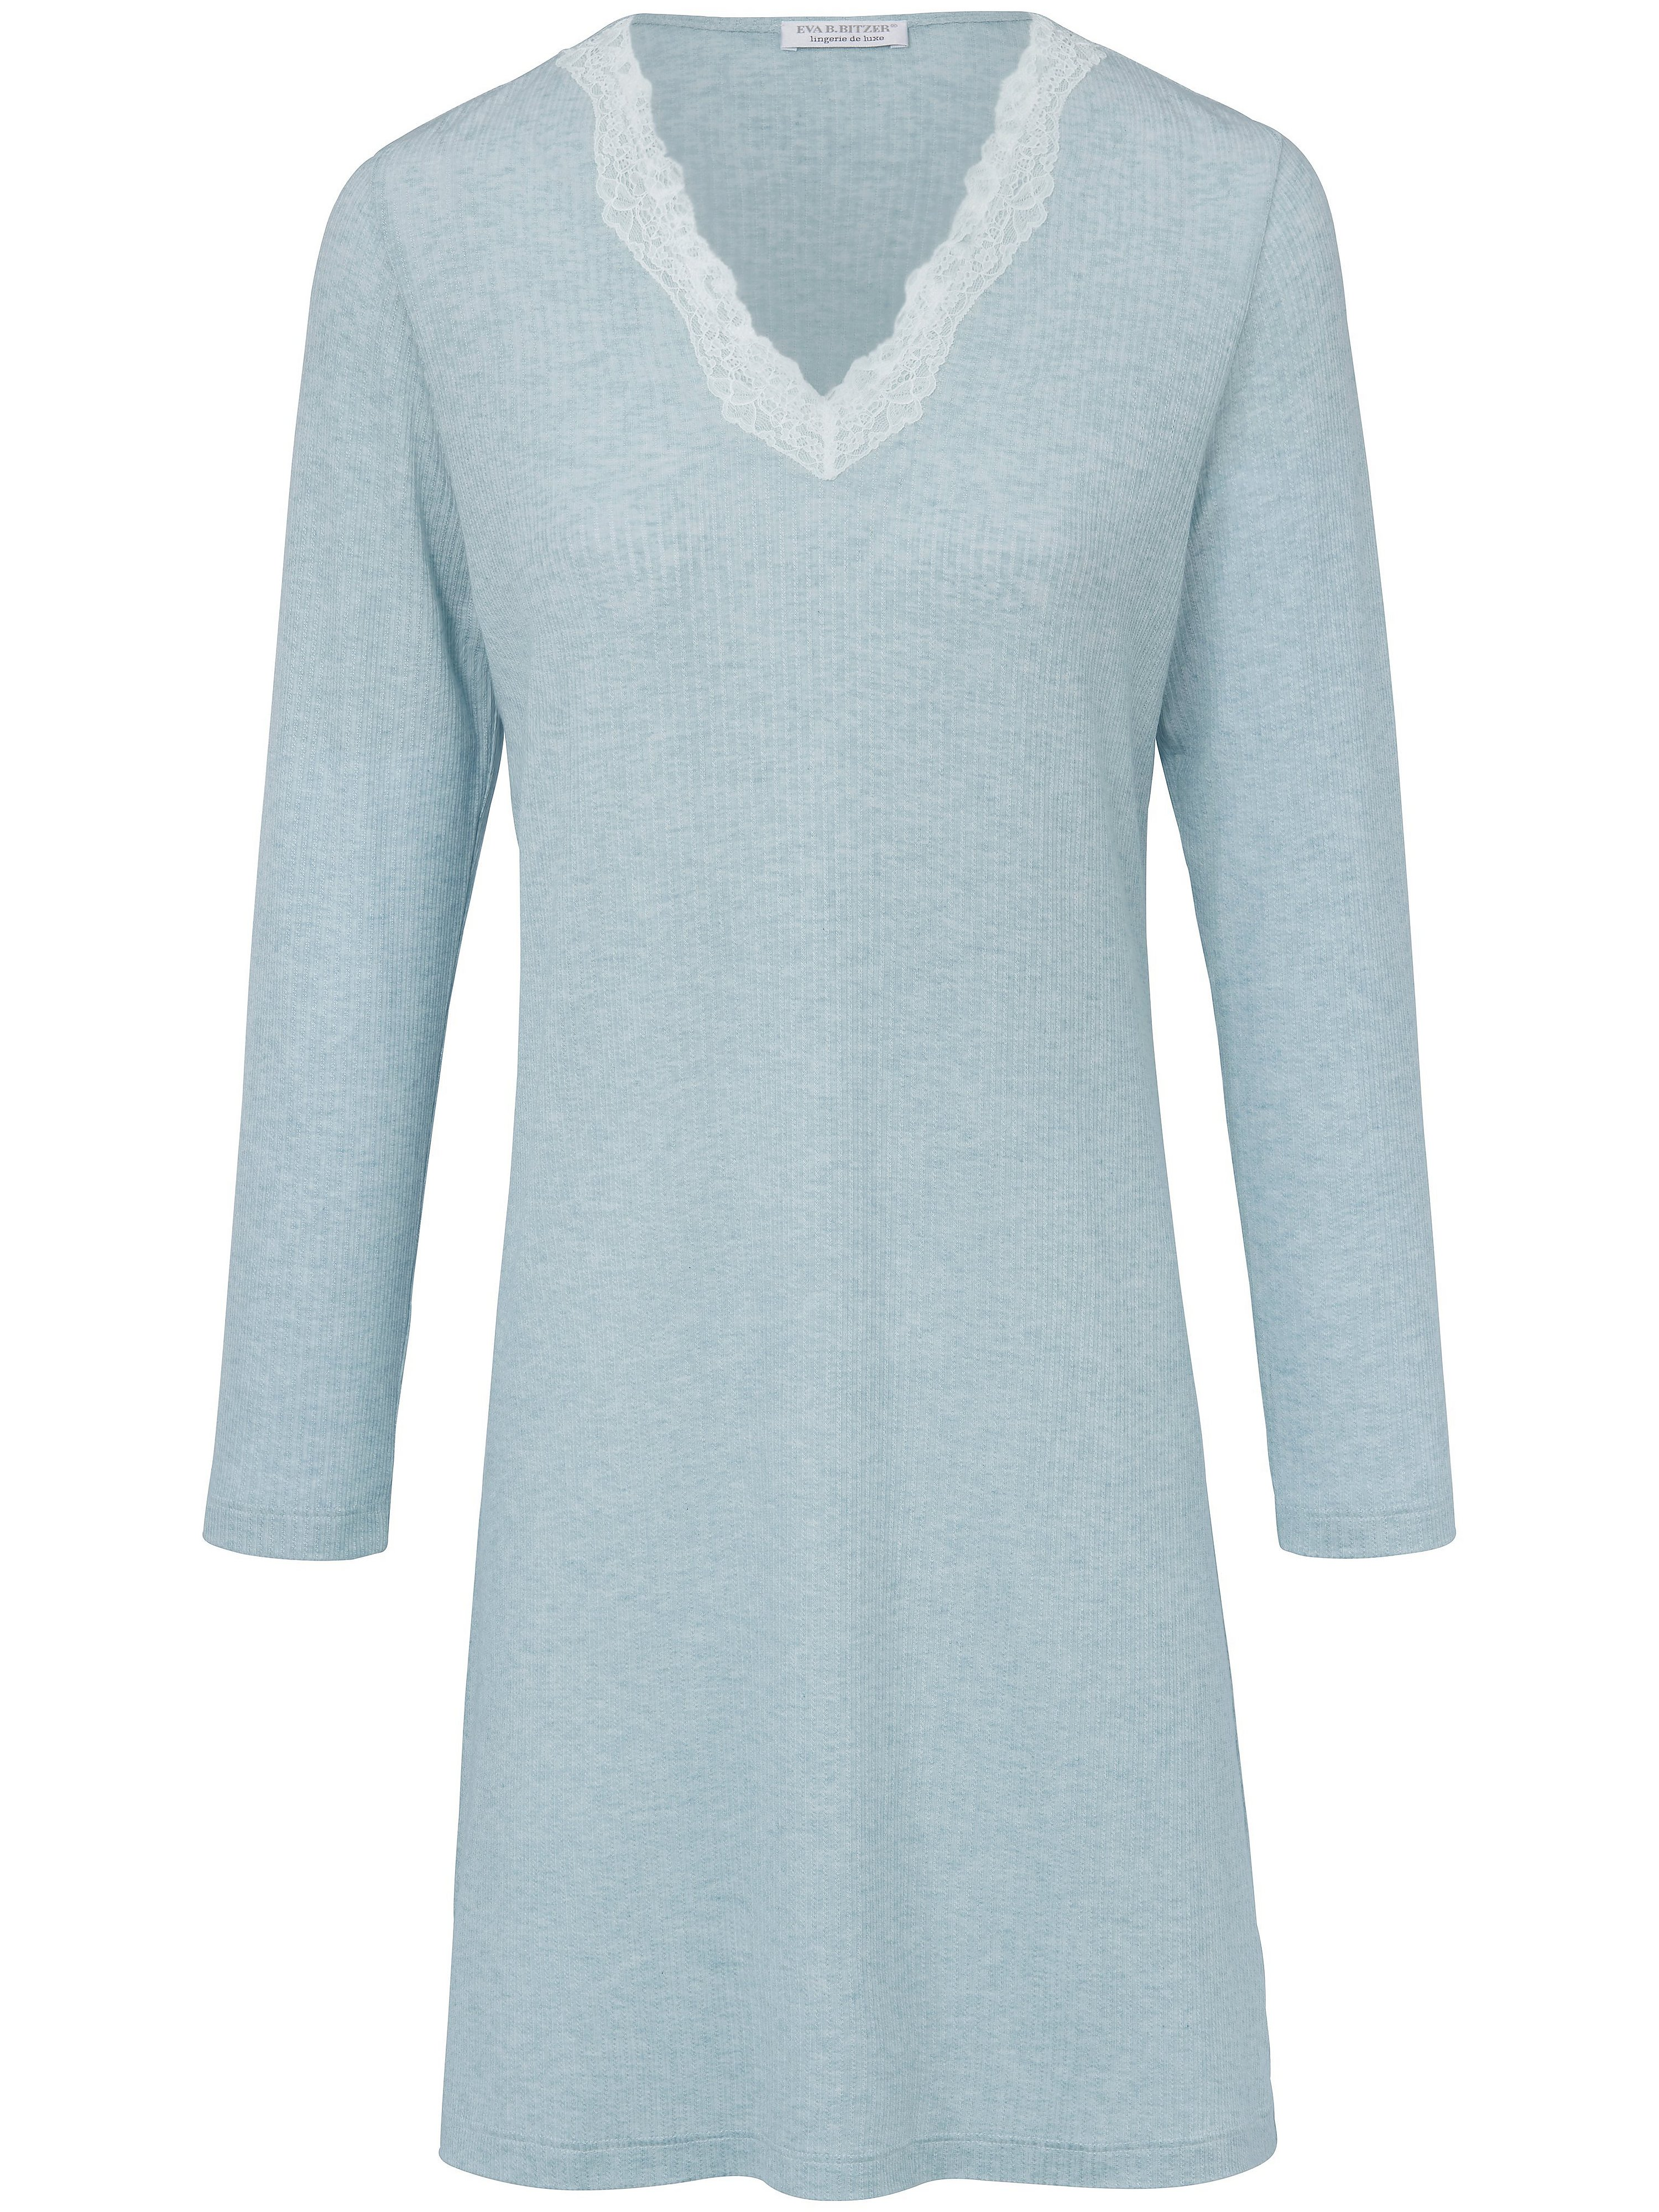 La chemise nuit  Eva B. Bitzer bleu taille 40